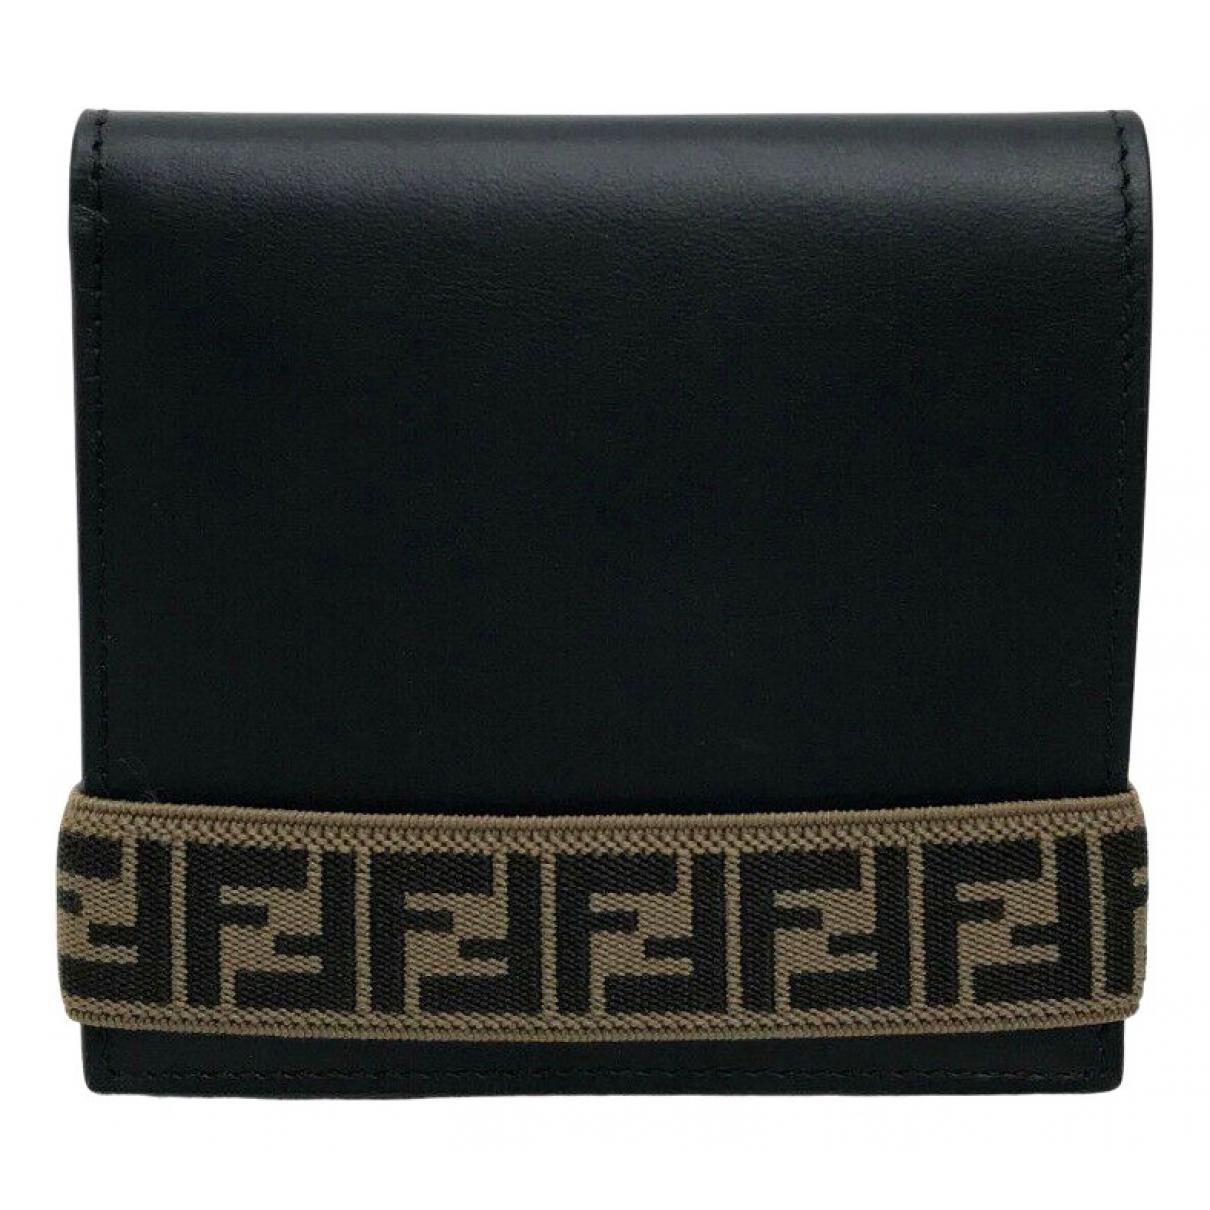 Fendi N Black Leather wallet for Women N